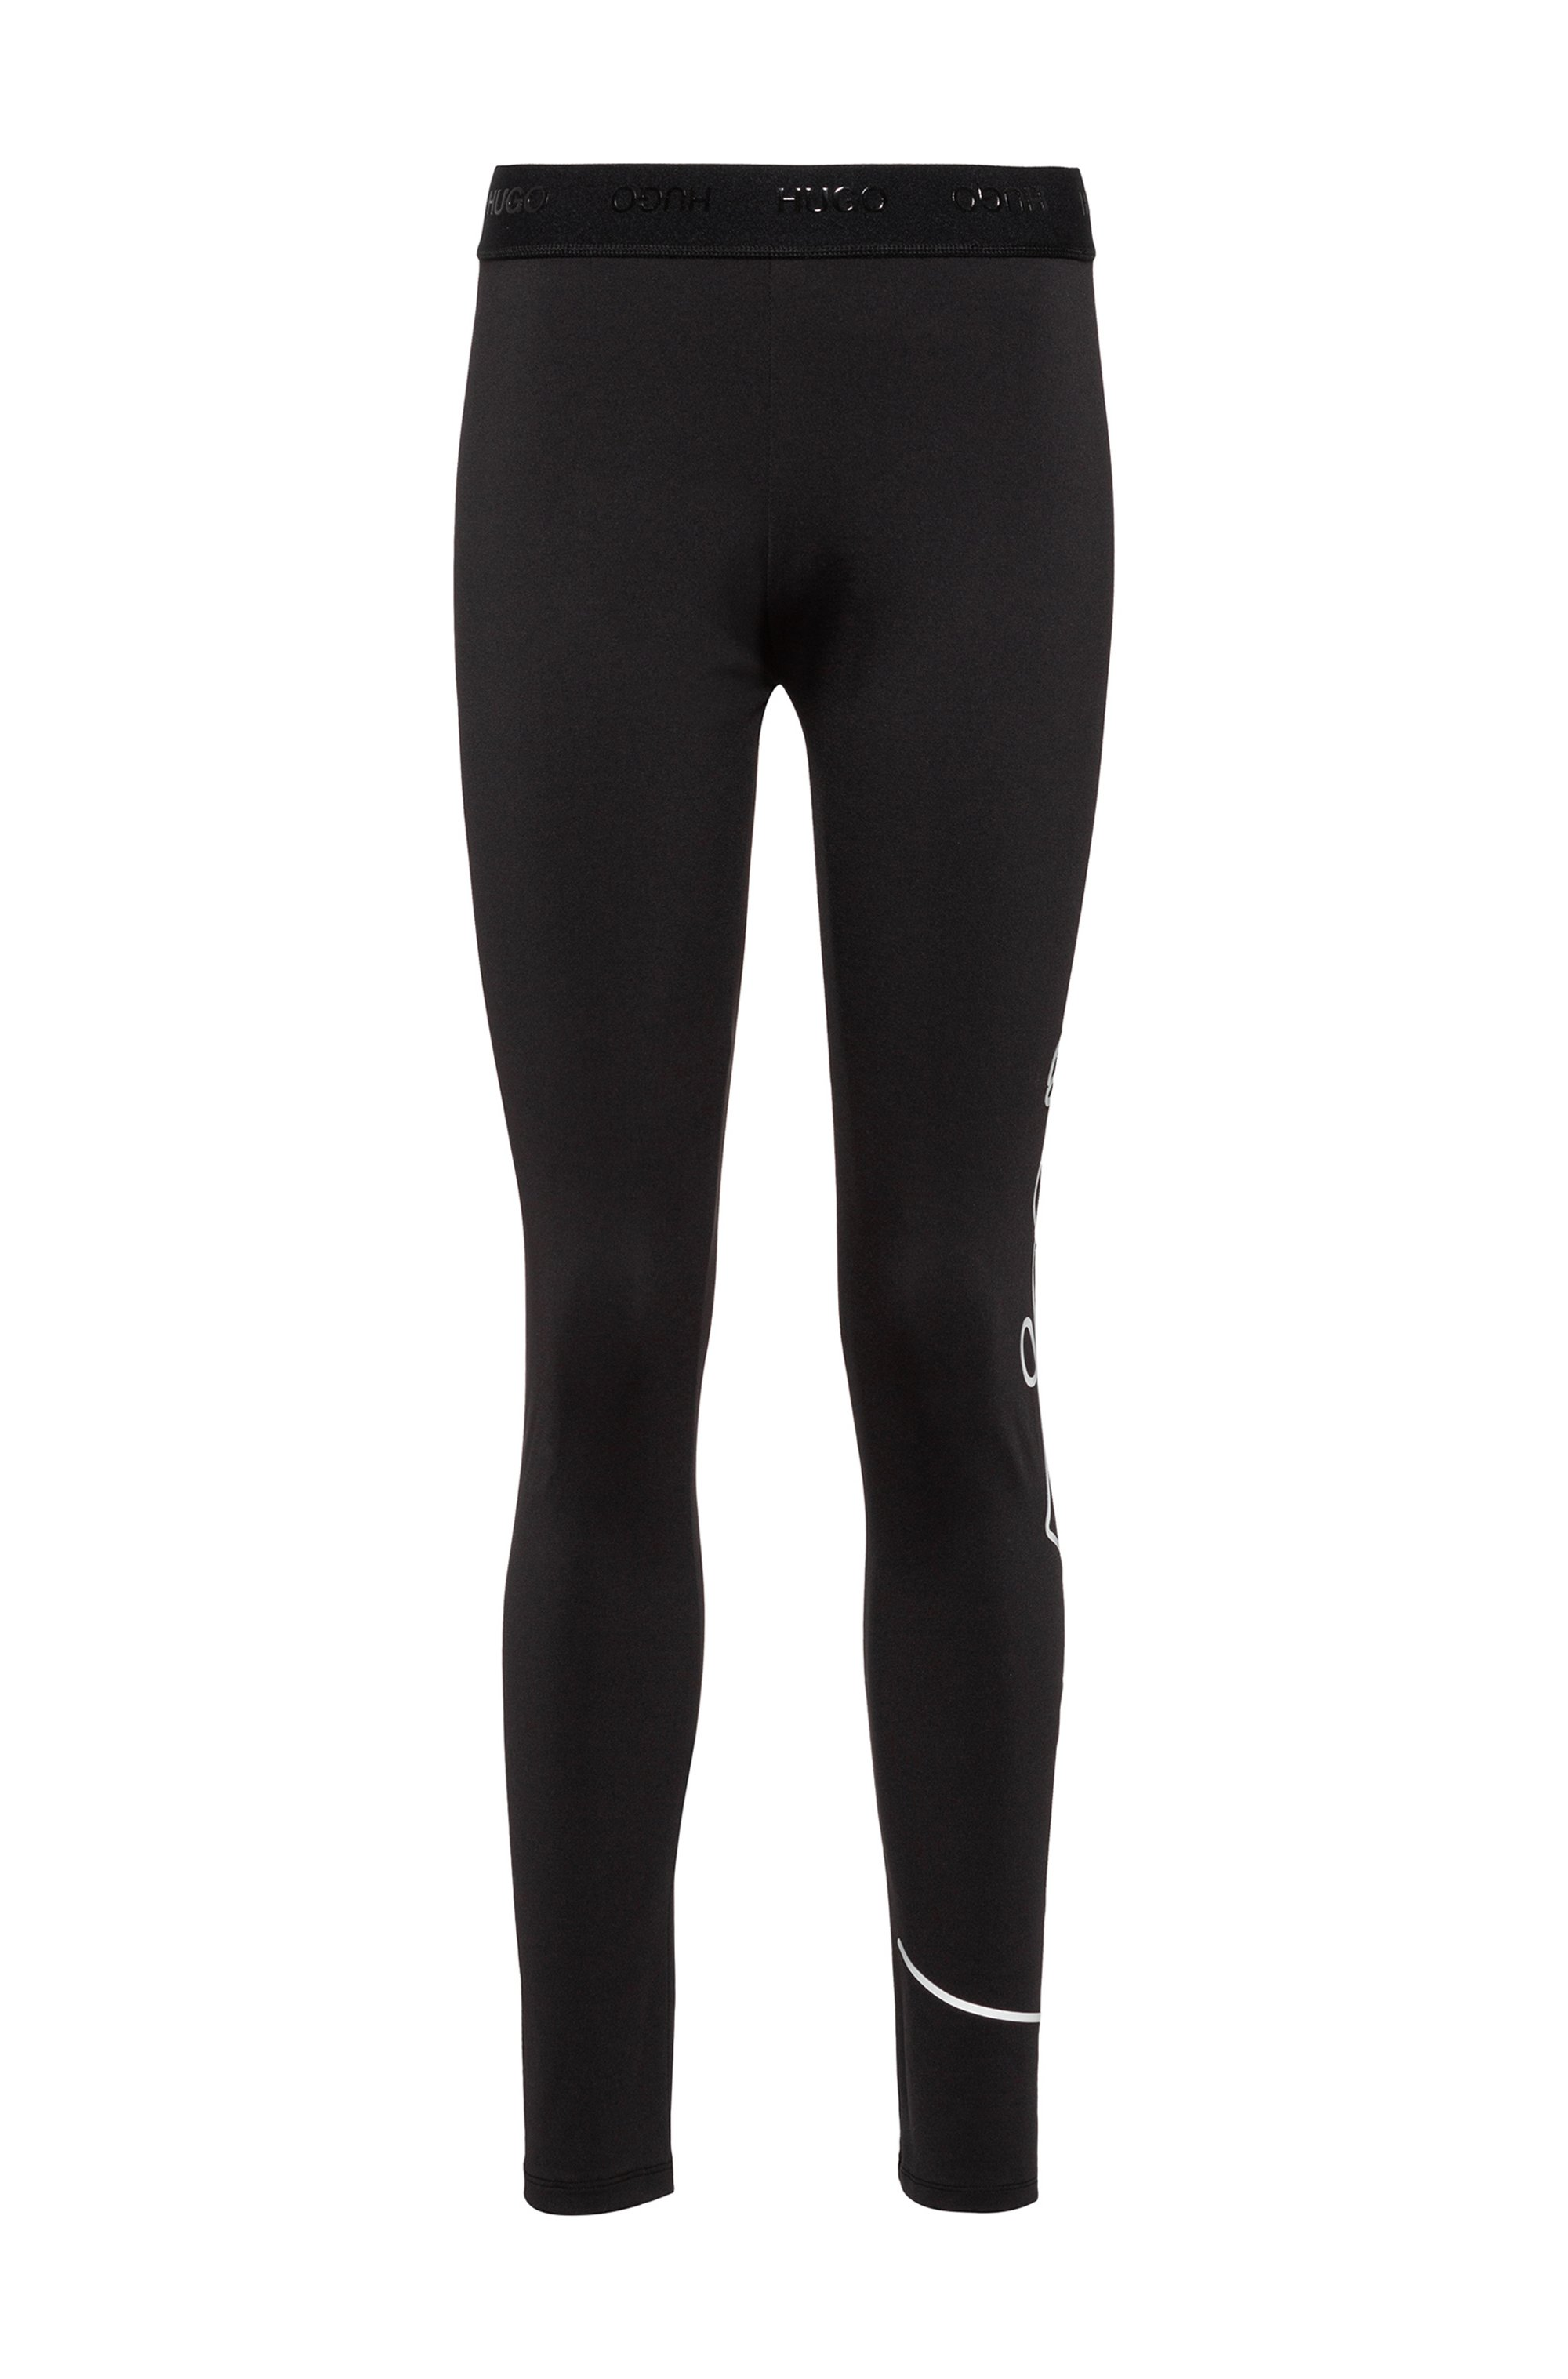 Skinny-fit leggings with hand-written logo print, Black